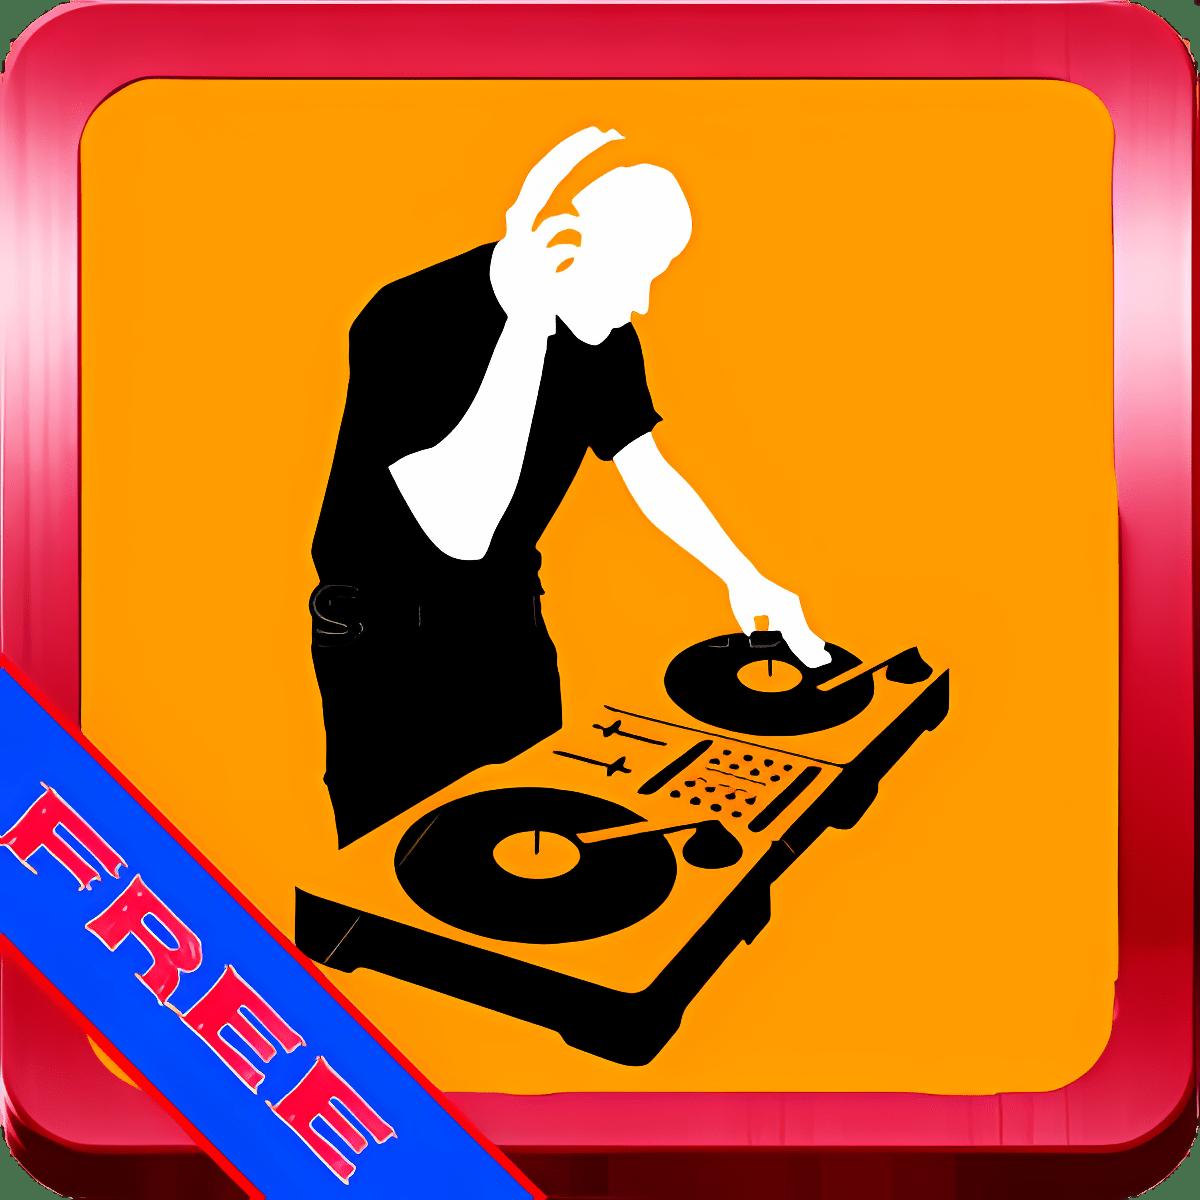 Scratch DJ SFX Sounds APP